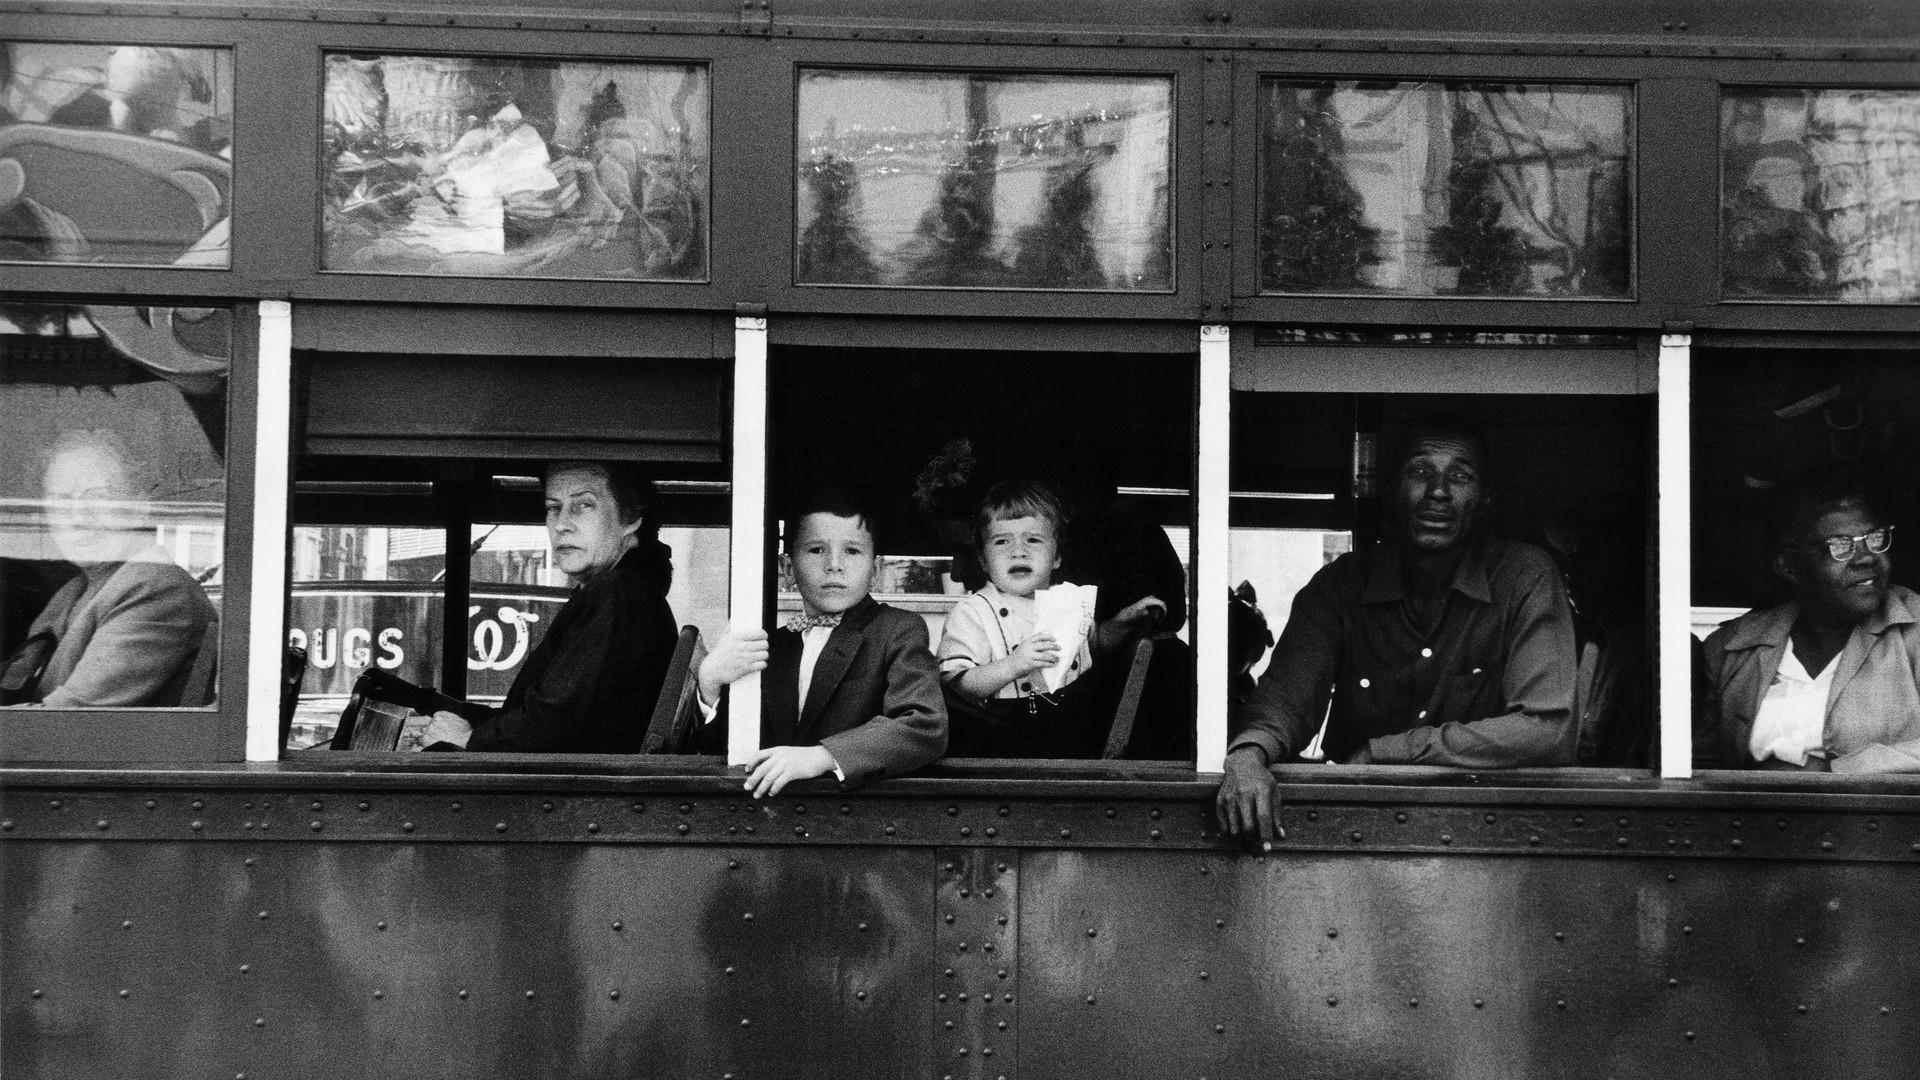 Robert Frank, Trolley - New Orleans, 1955-1956